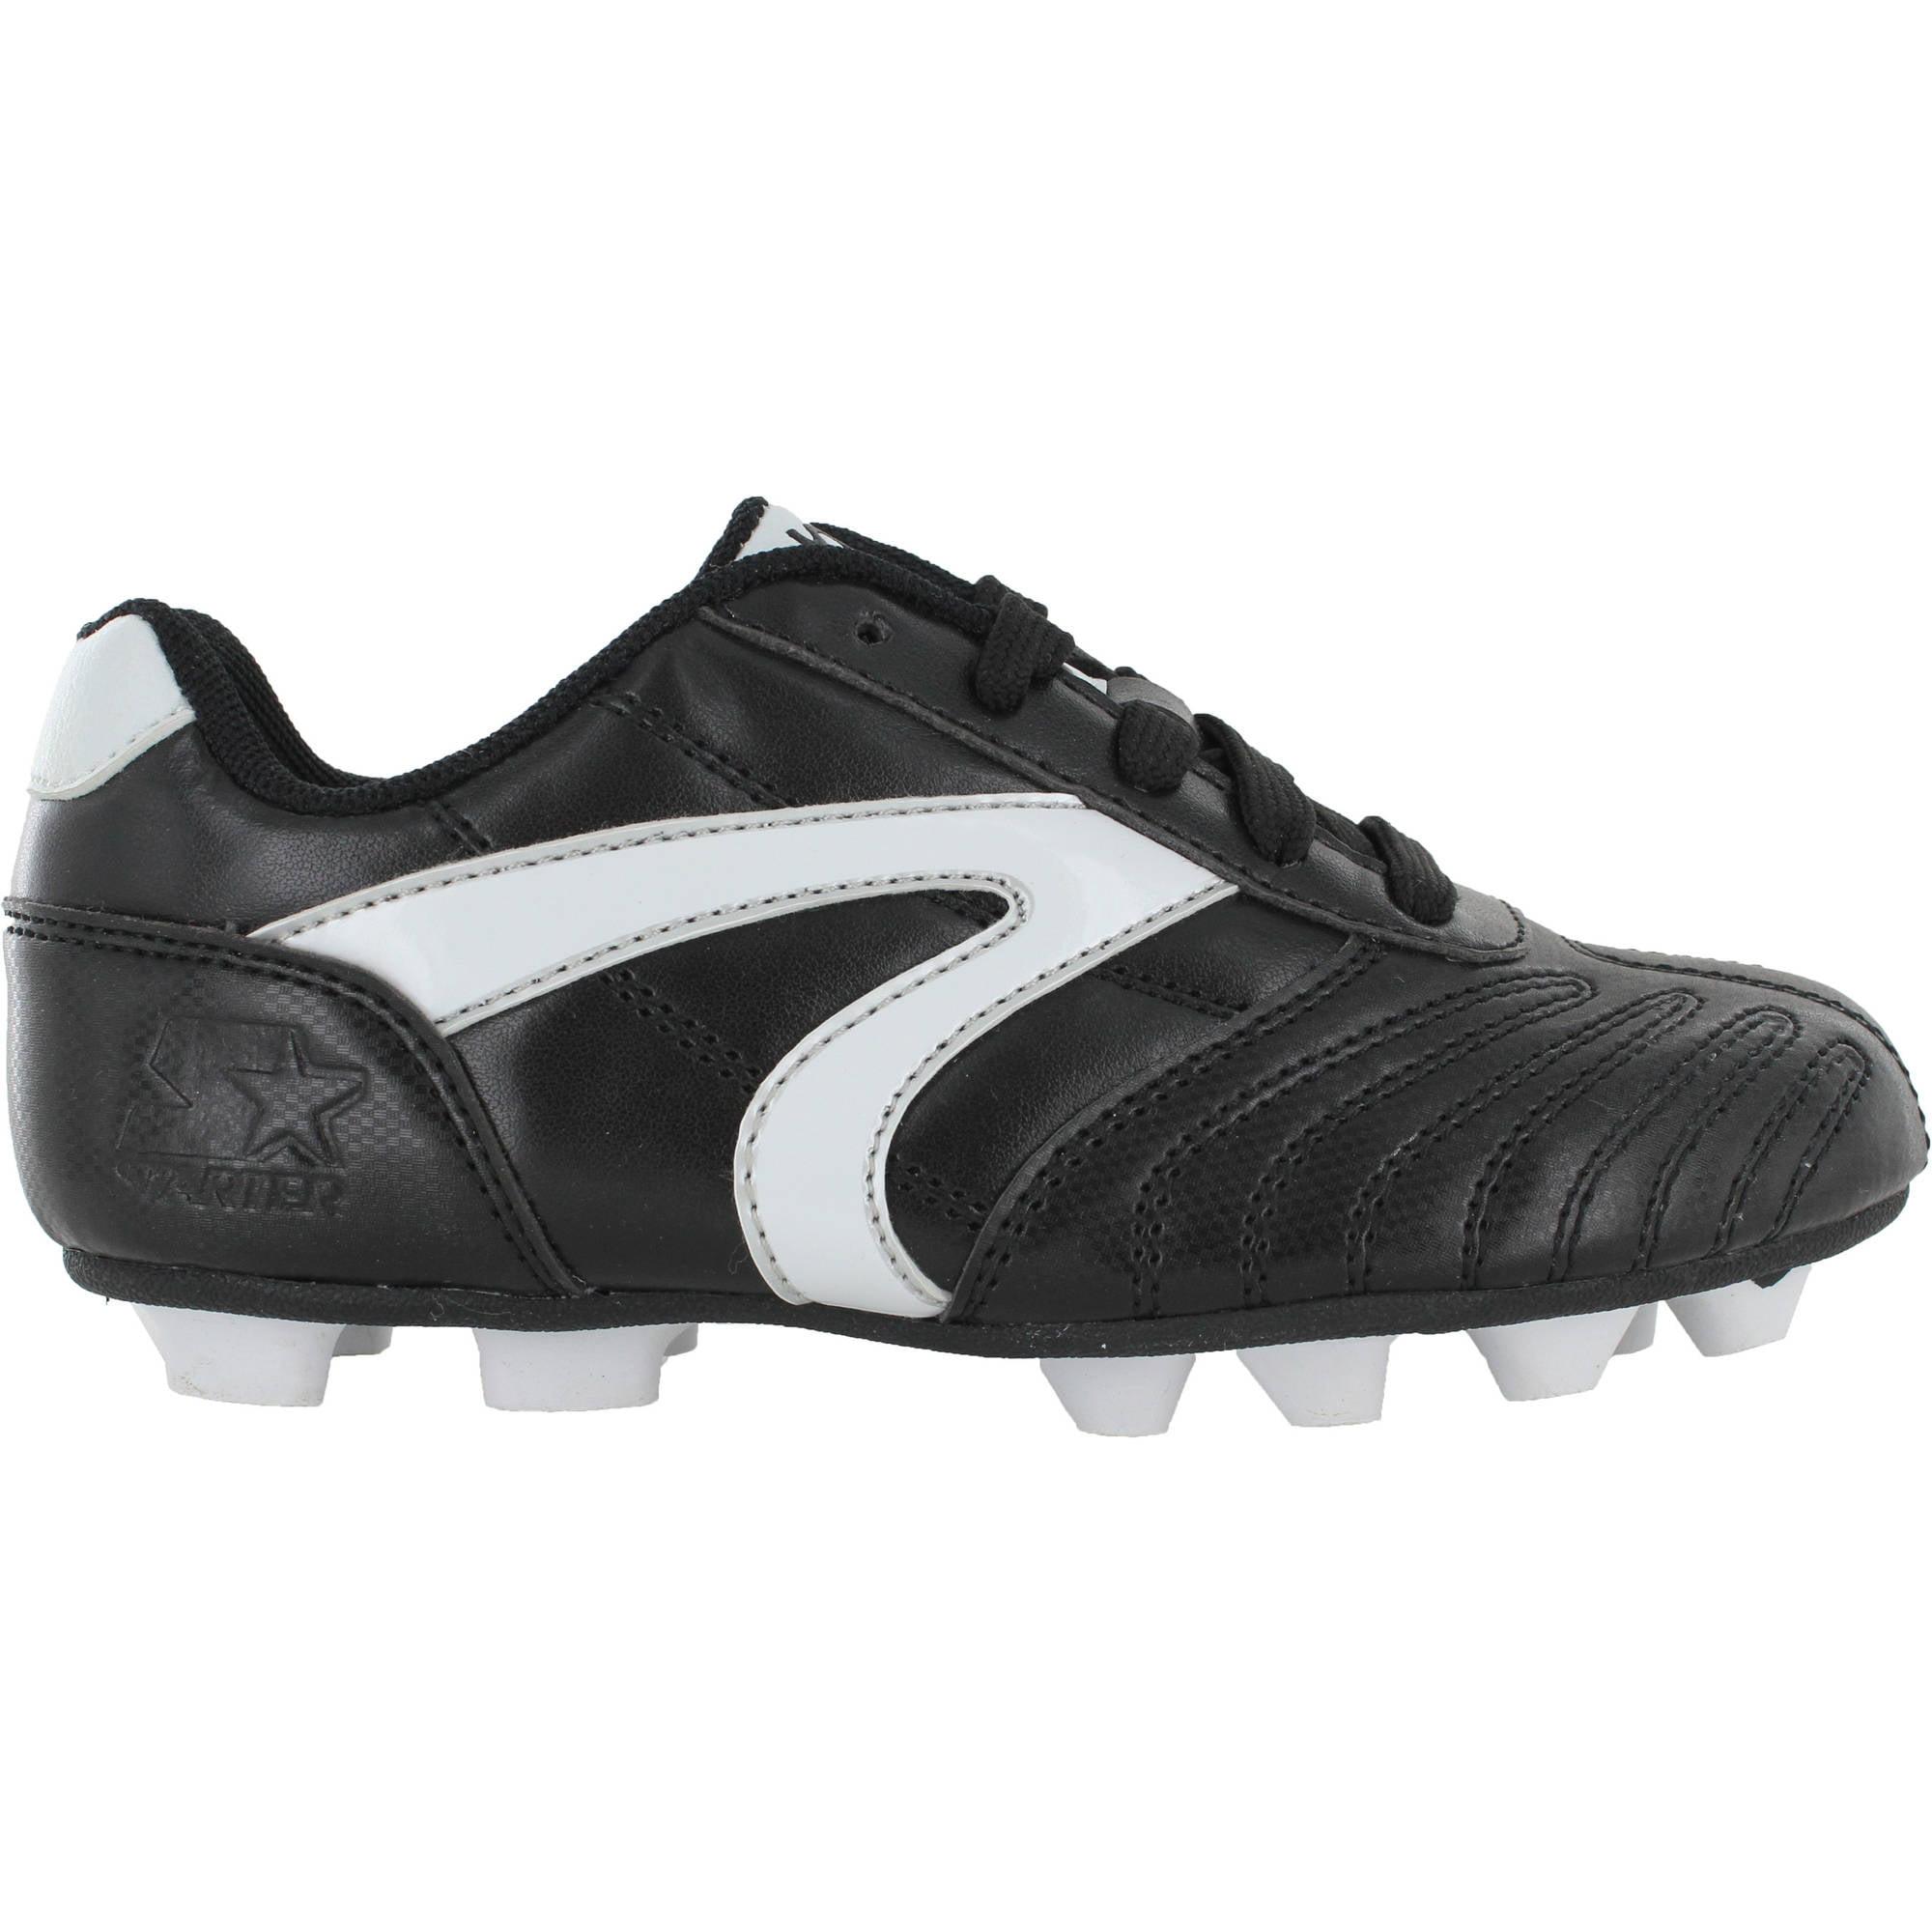 54a479833 Starter - Boys  Athletic Sidewinder Soccer Cleat - Walmart.com